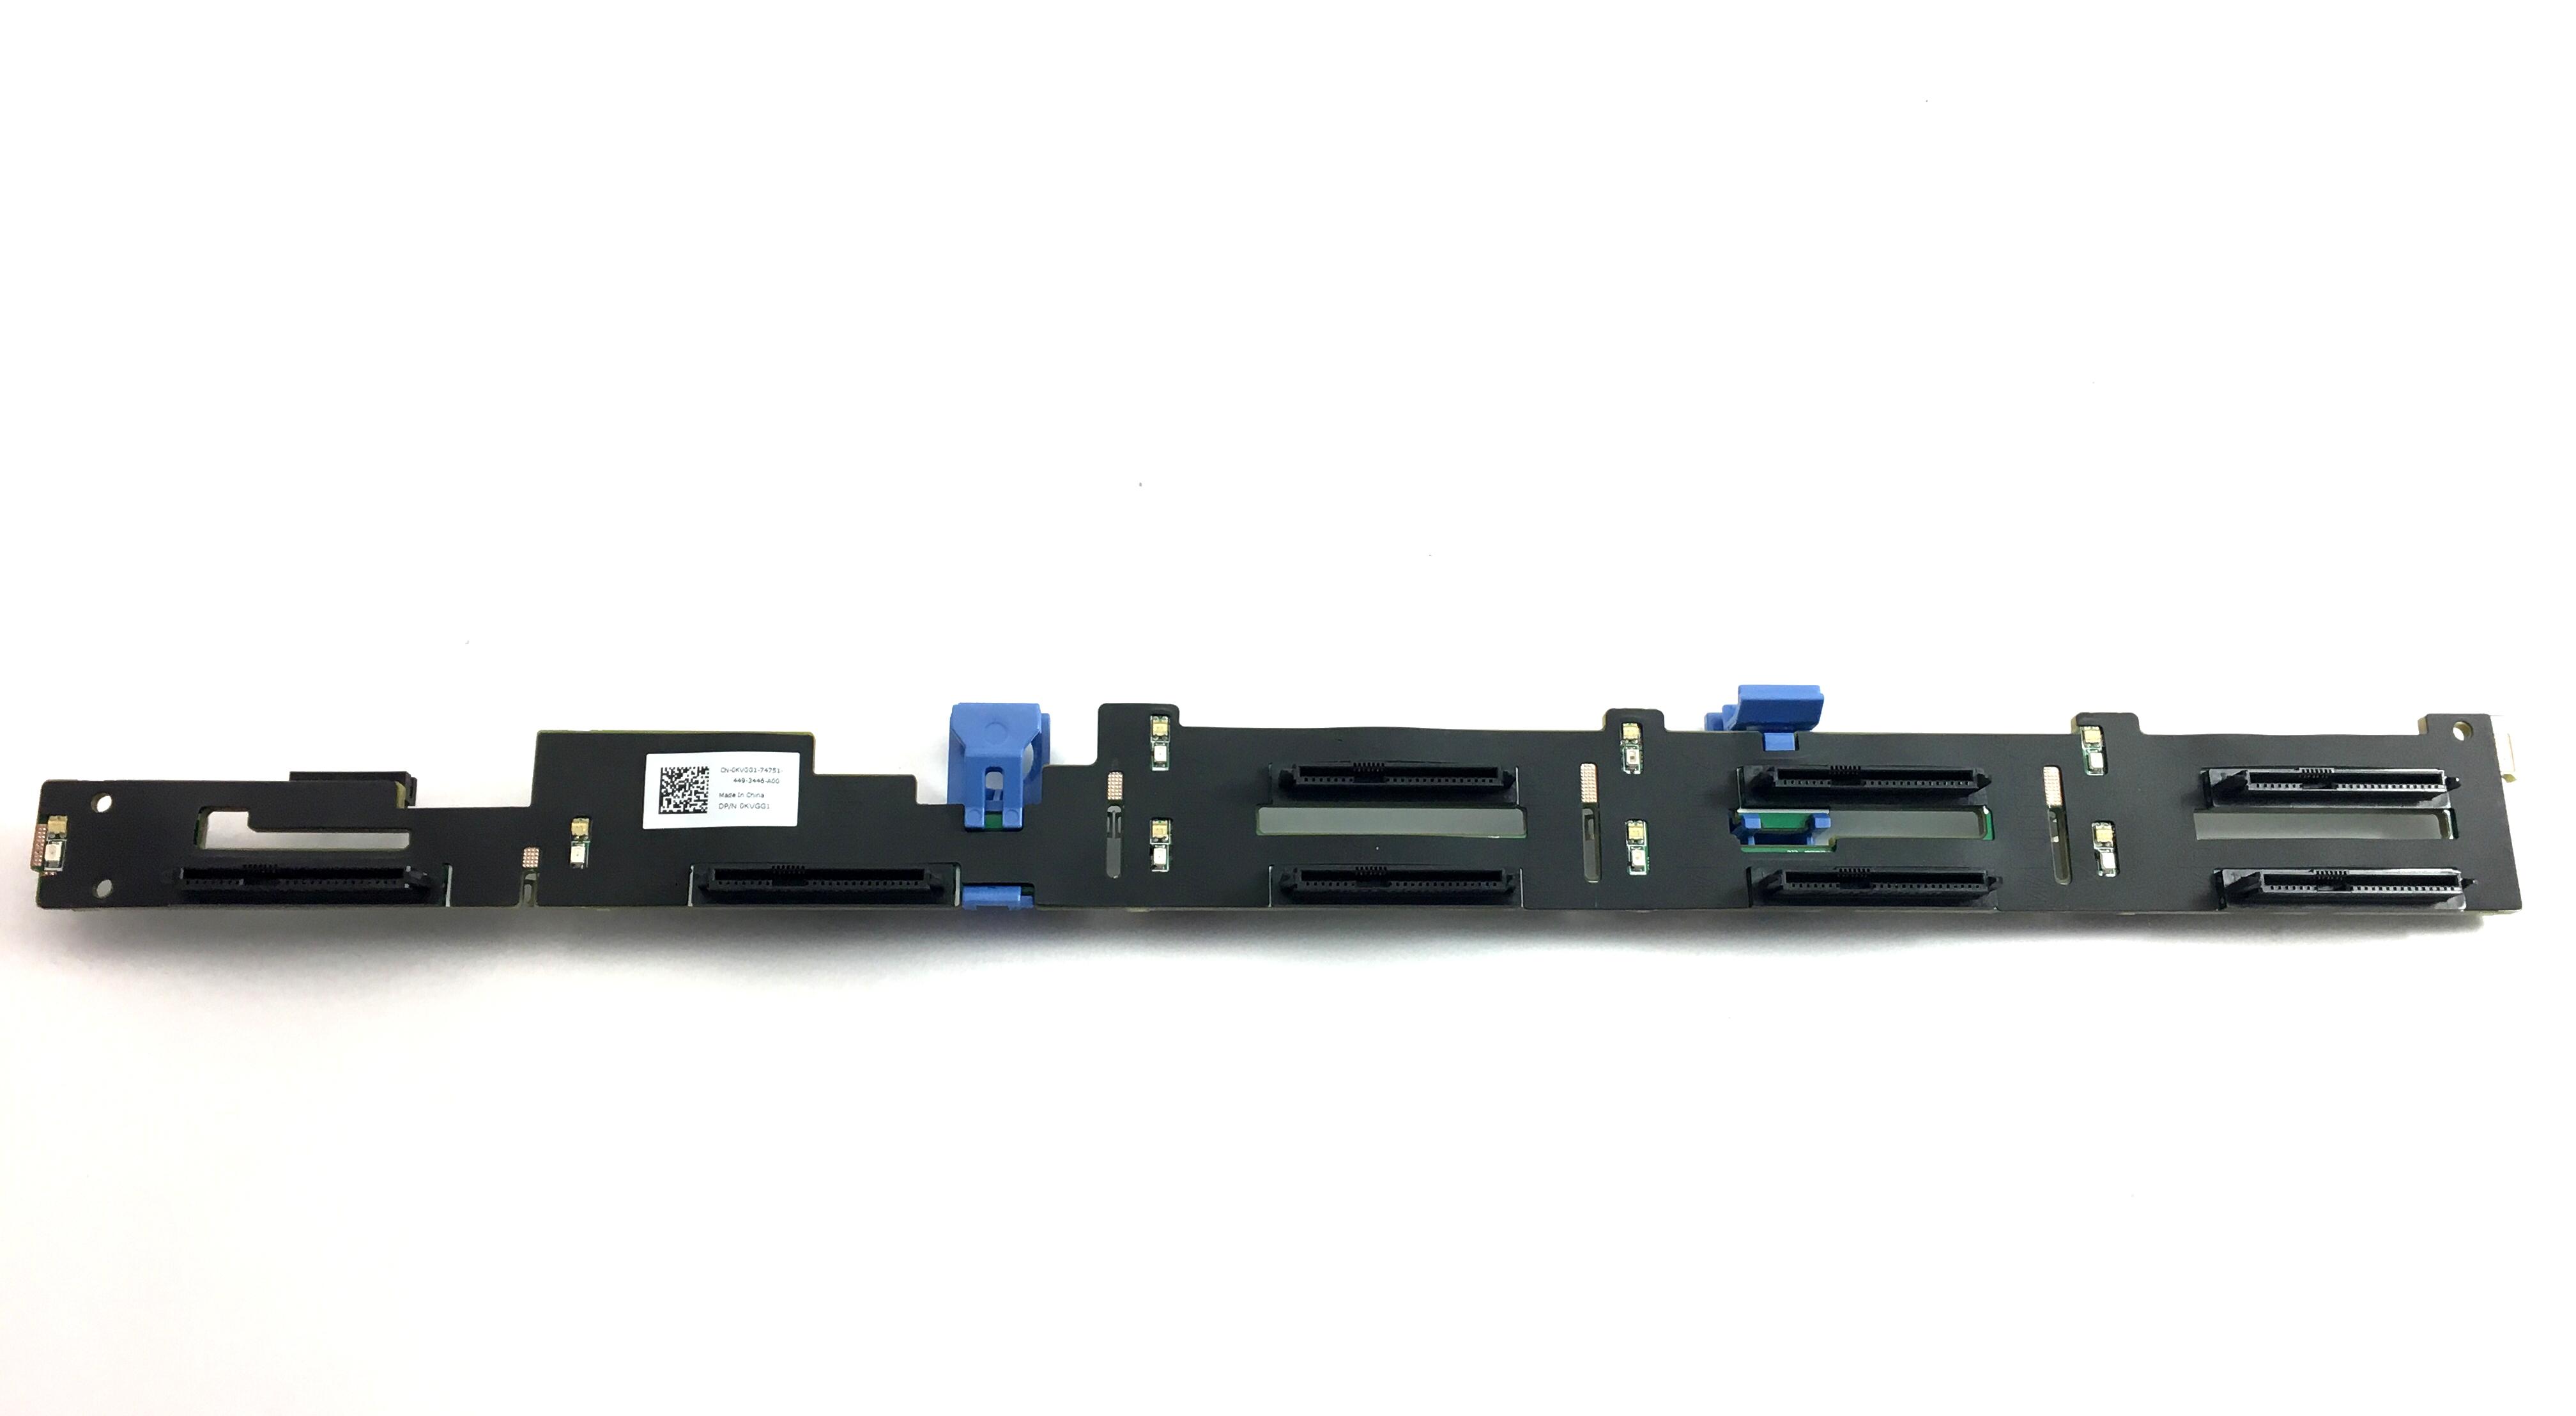 Dell 0KVGG1 8 Bay 2.5 SAS Hard Drive Backplane for PowerEdge C-2